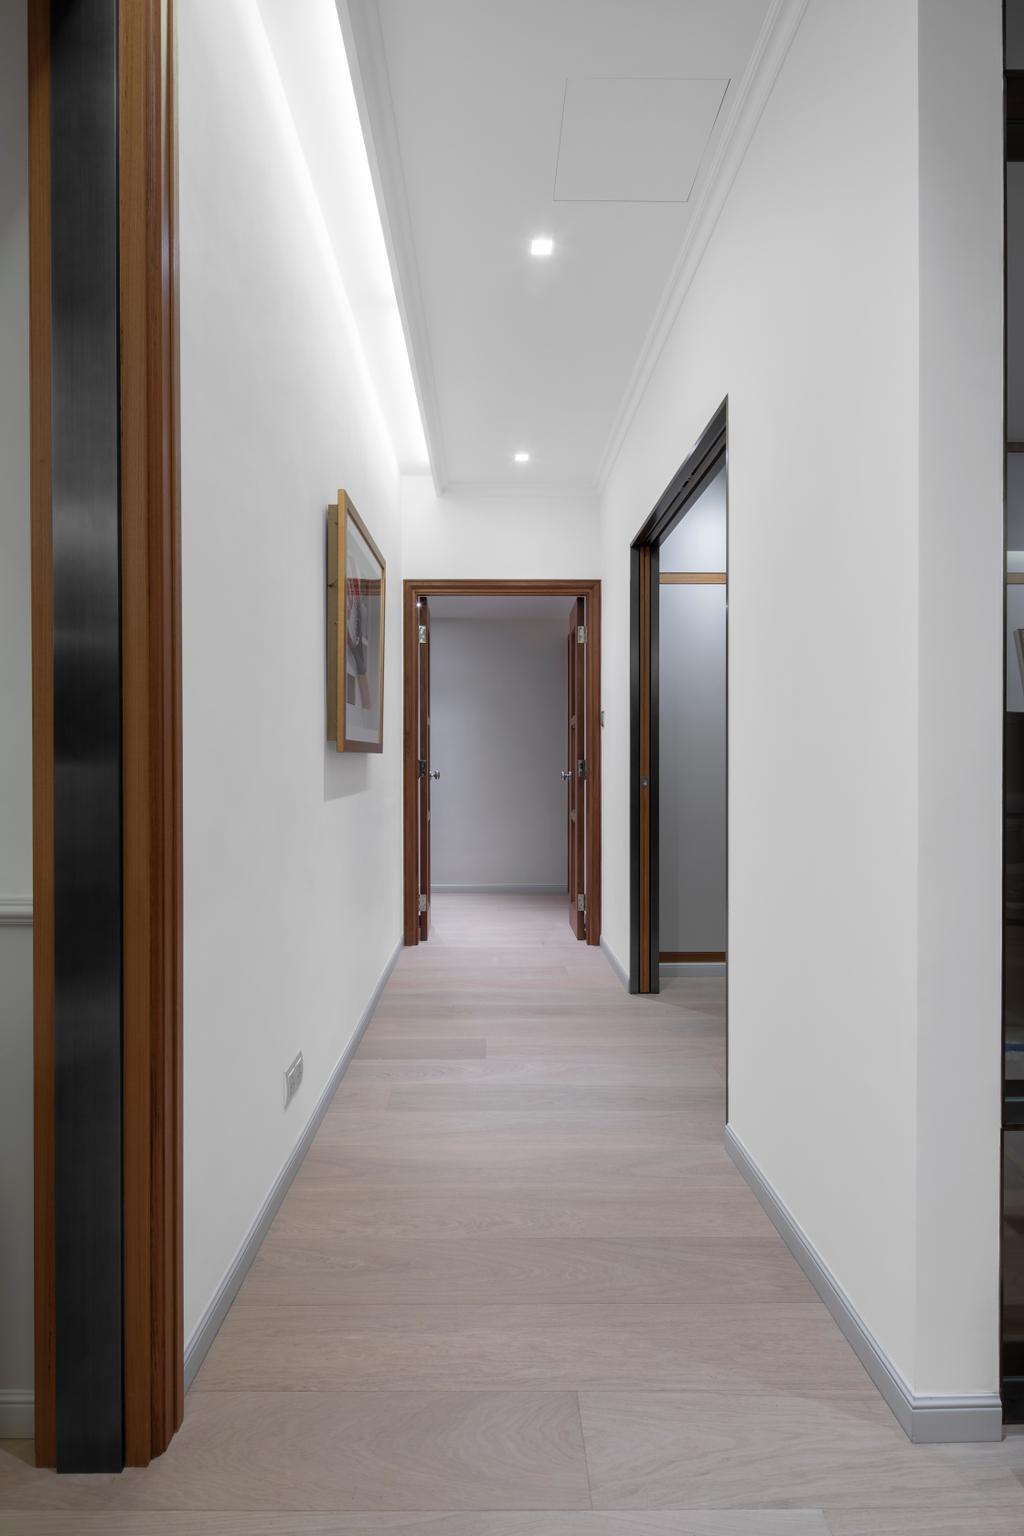 私家樓, 雅柏苑, 室內設計師, Ash Studio